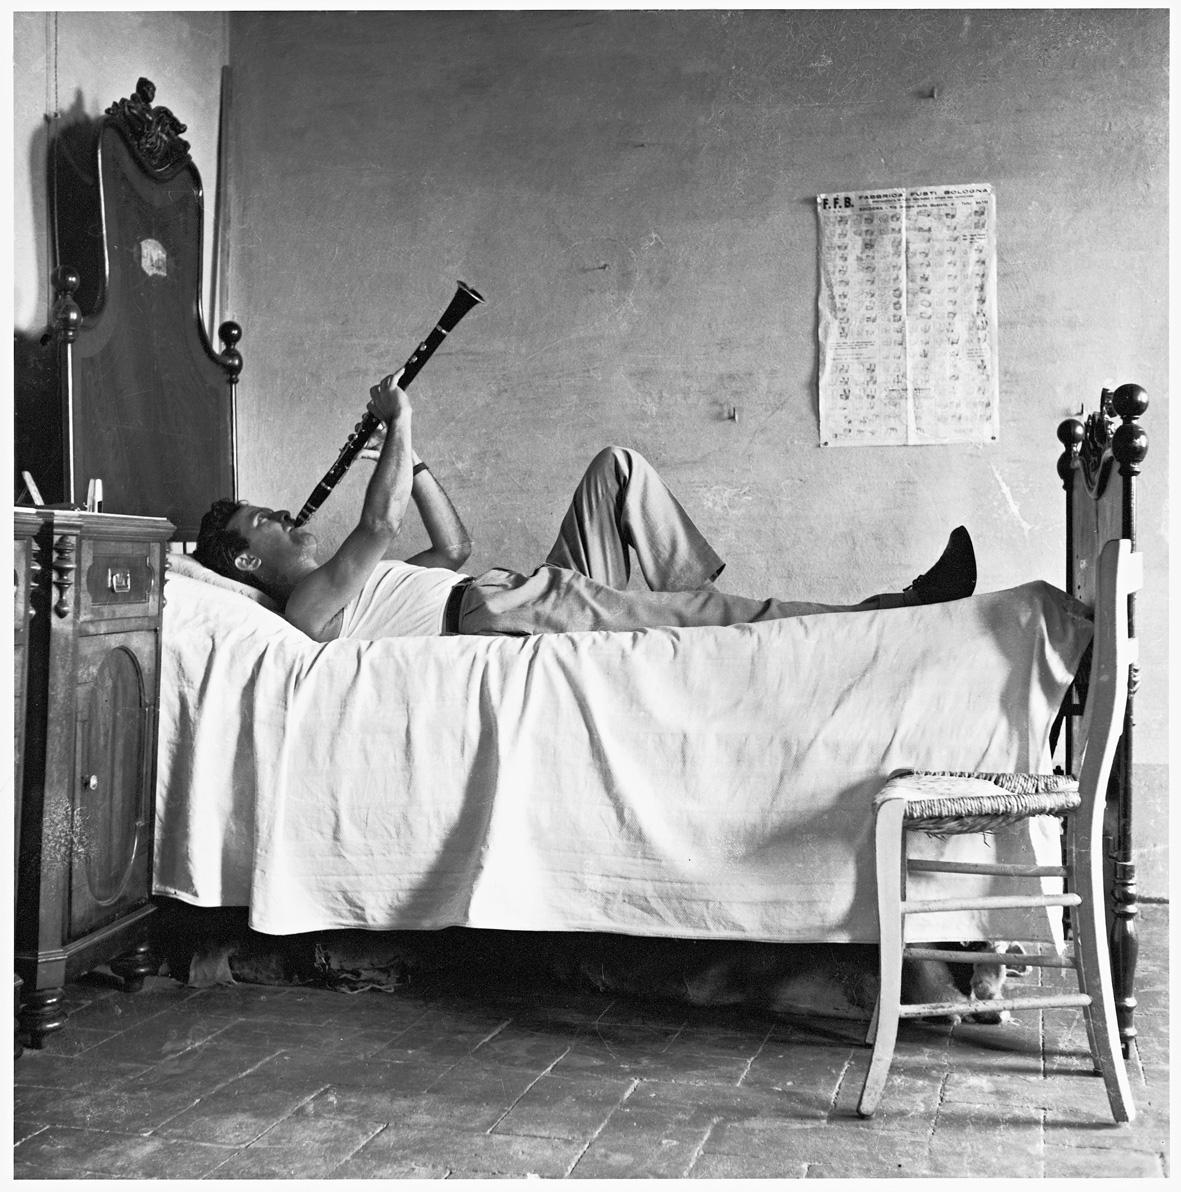 Pietro Donzelli: Giorno di festa, 1954 © Renate Siebenhaar, Estate  Pietro Donzelli, Frankfurt a. M.